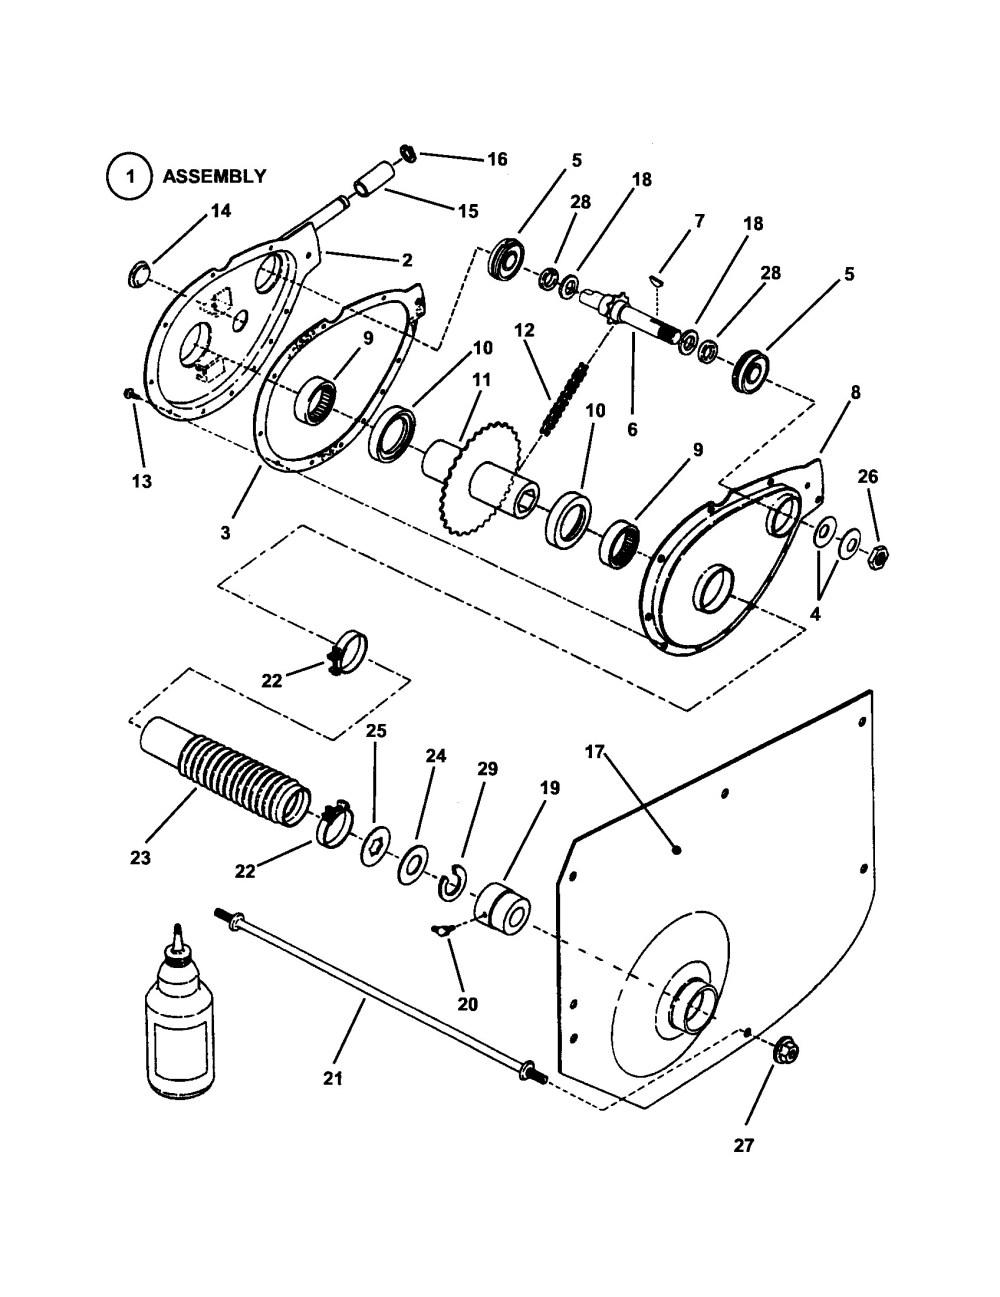 medium resolution of dixon lawn mower parts diagram snapper model m be lawn riding mower rear engine genuine parts